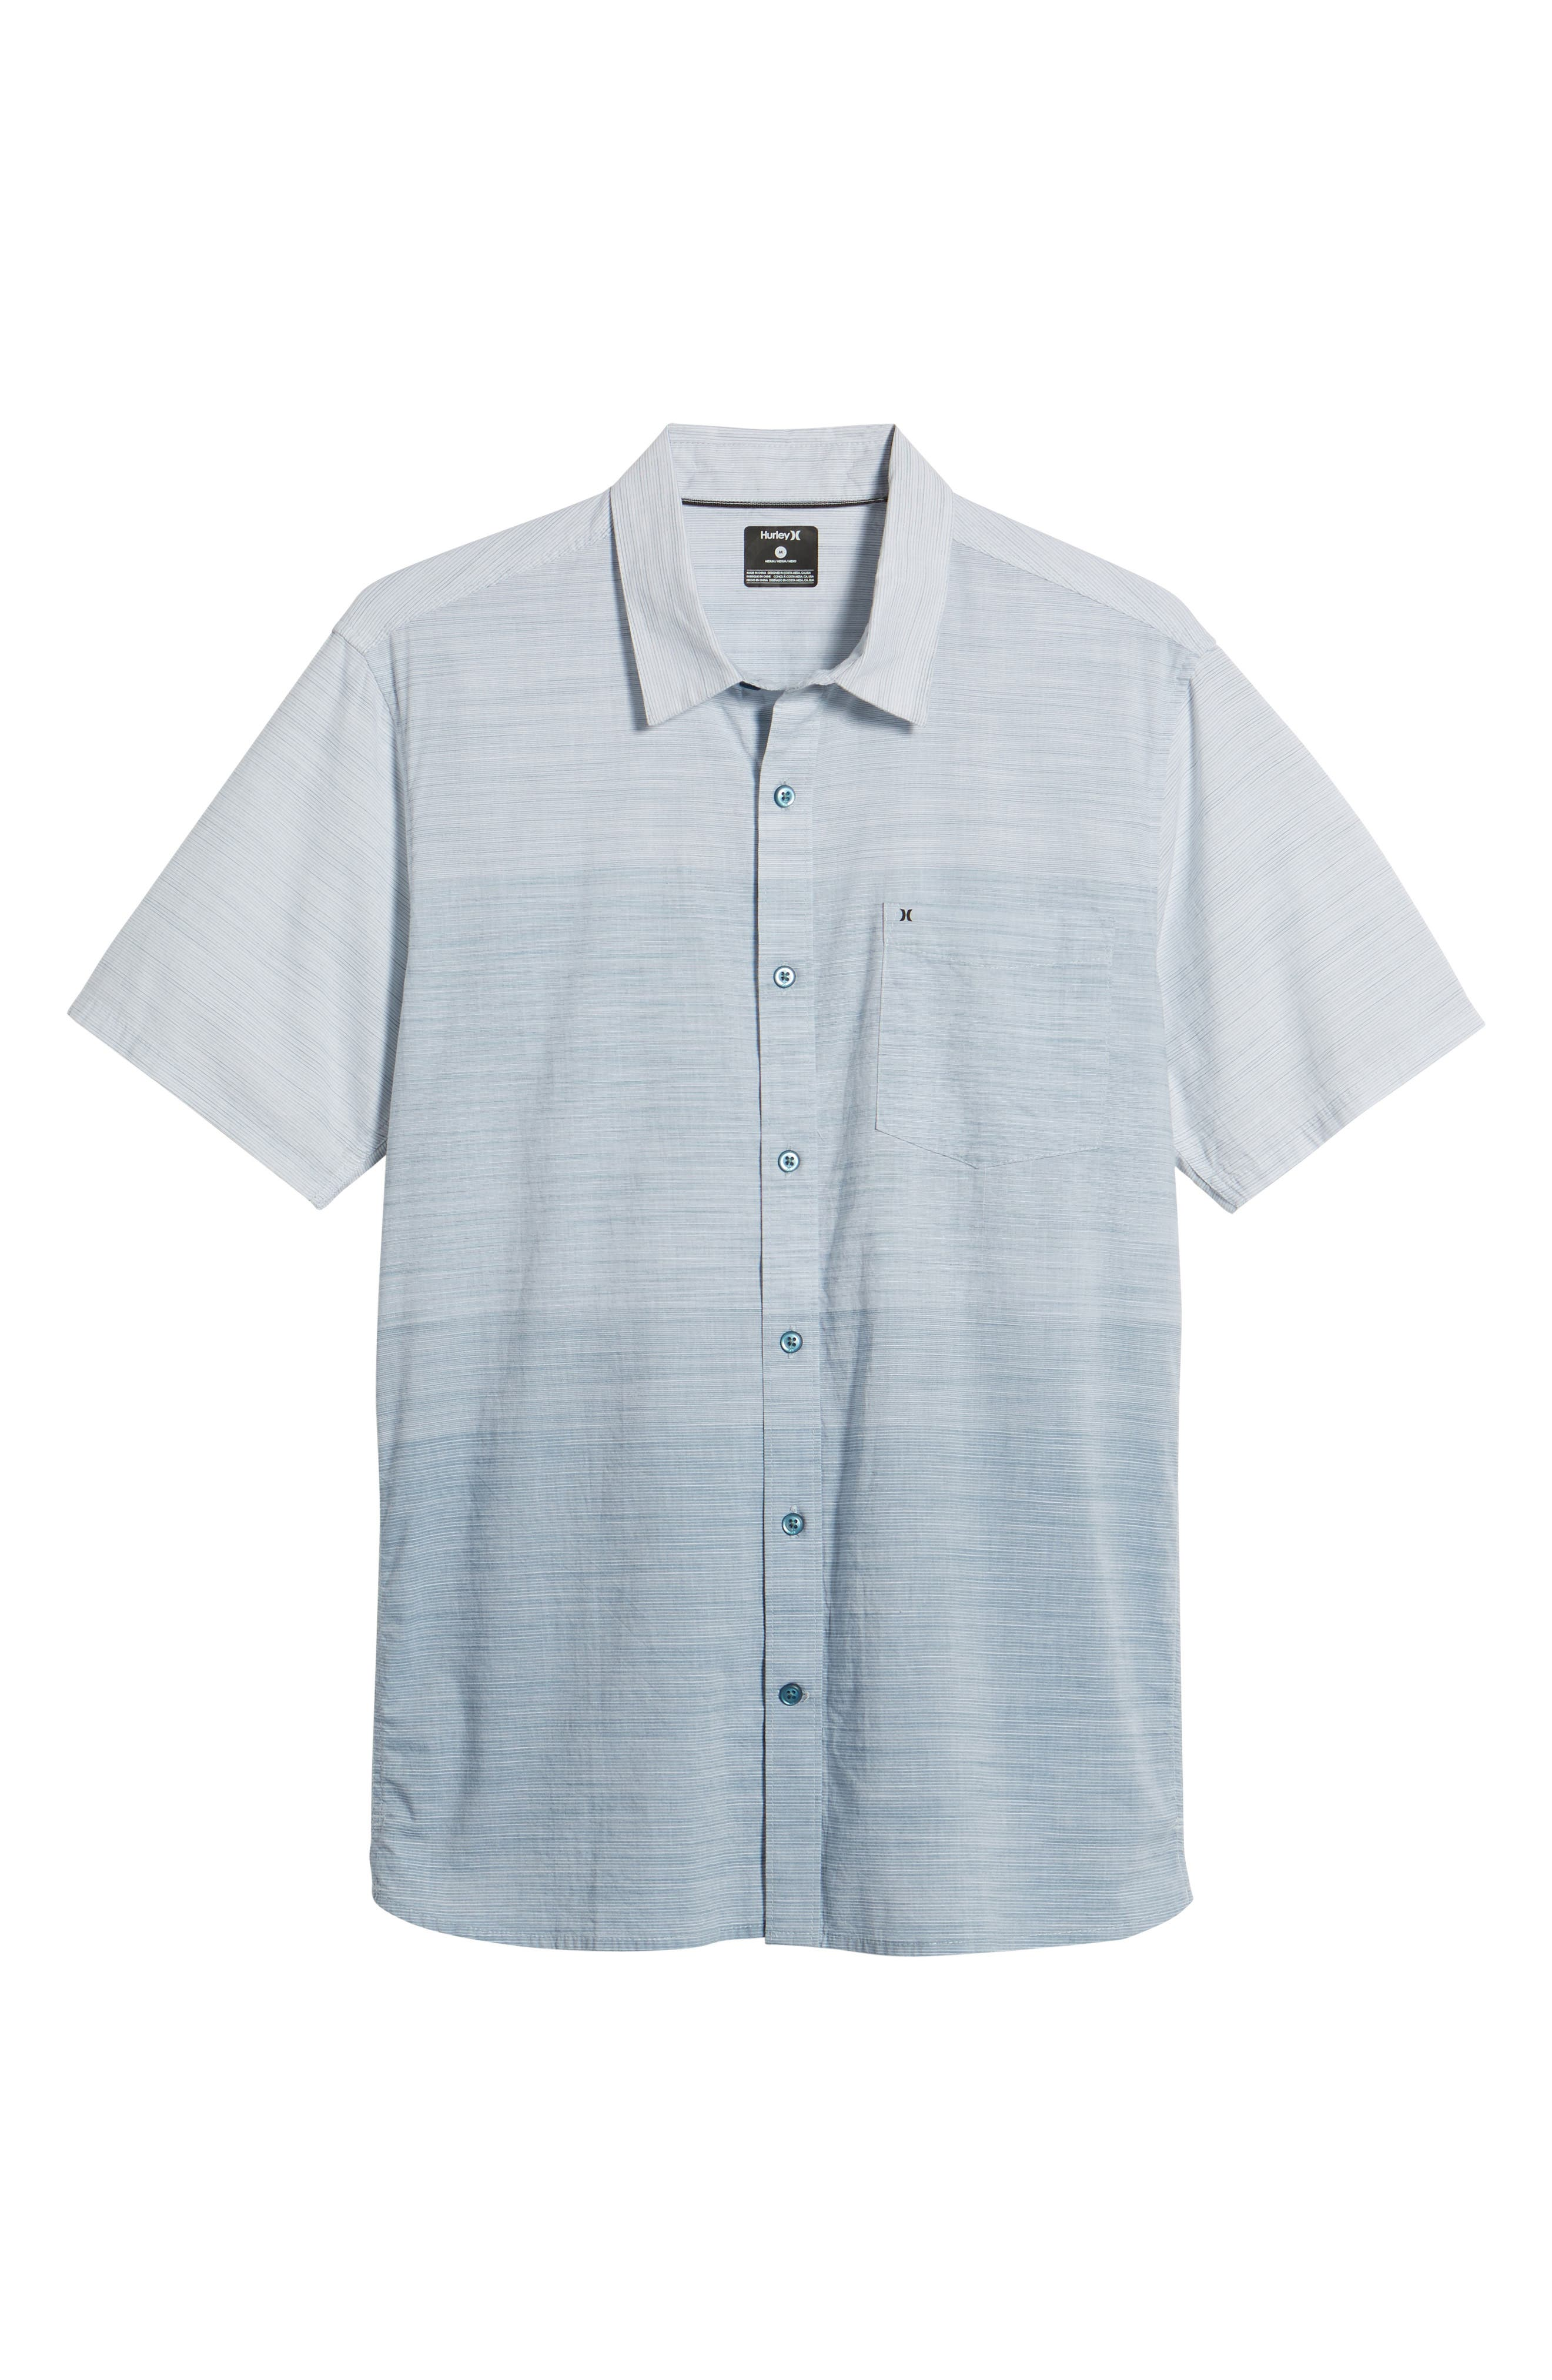 Hudson Woven Shirt,                             Alternate thumbnail 6, color,                             NOISE AQUA